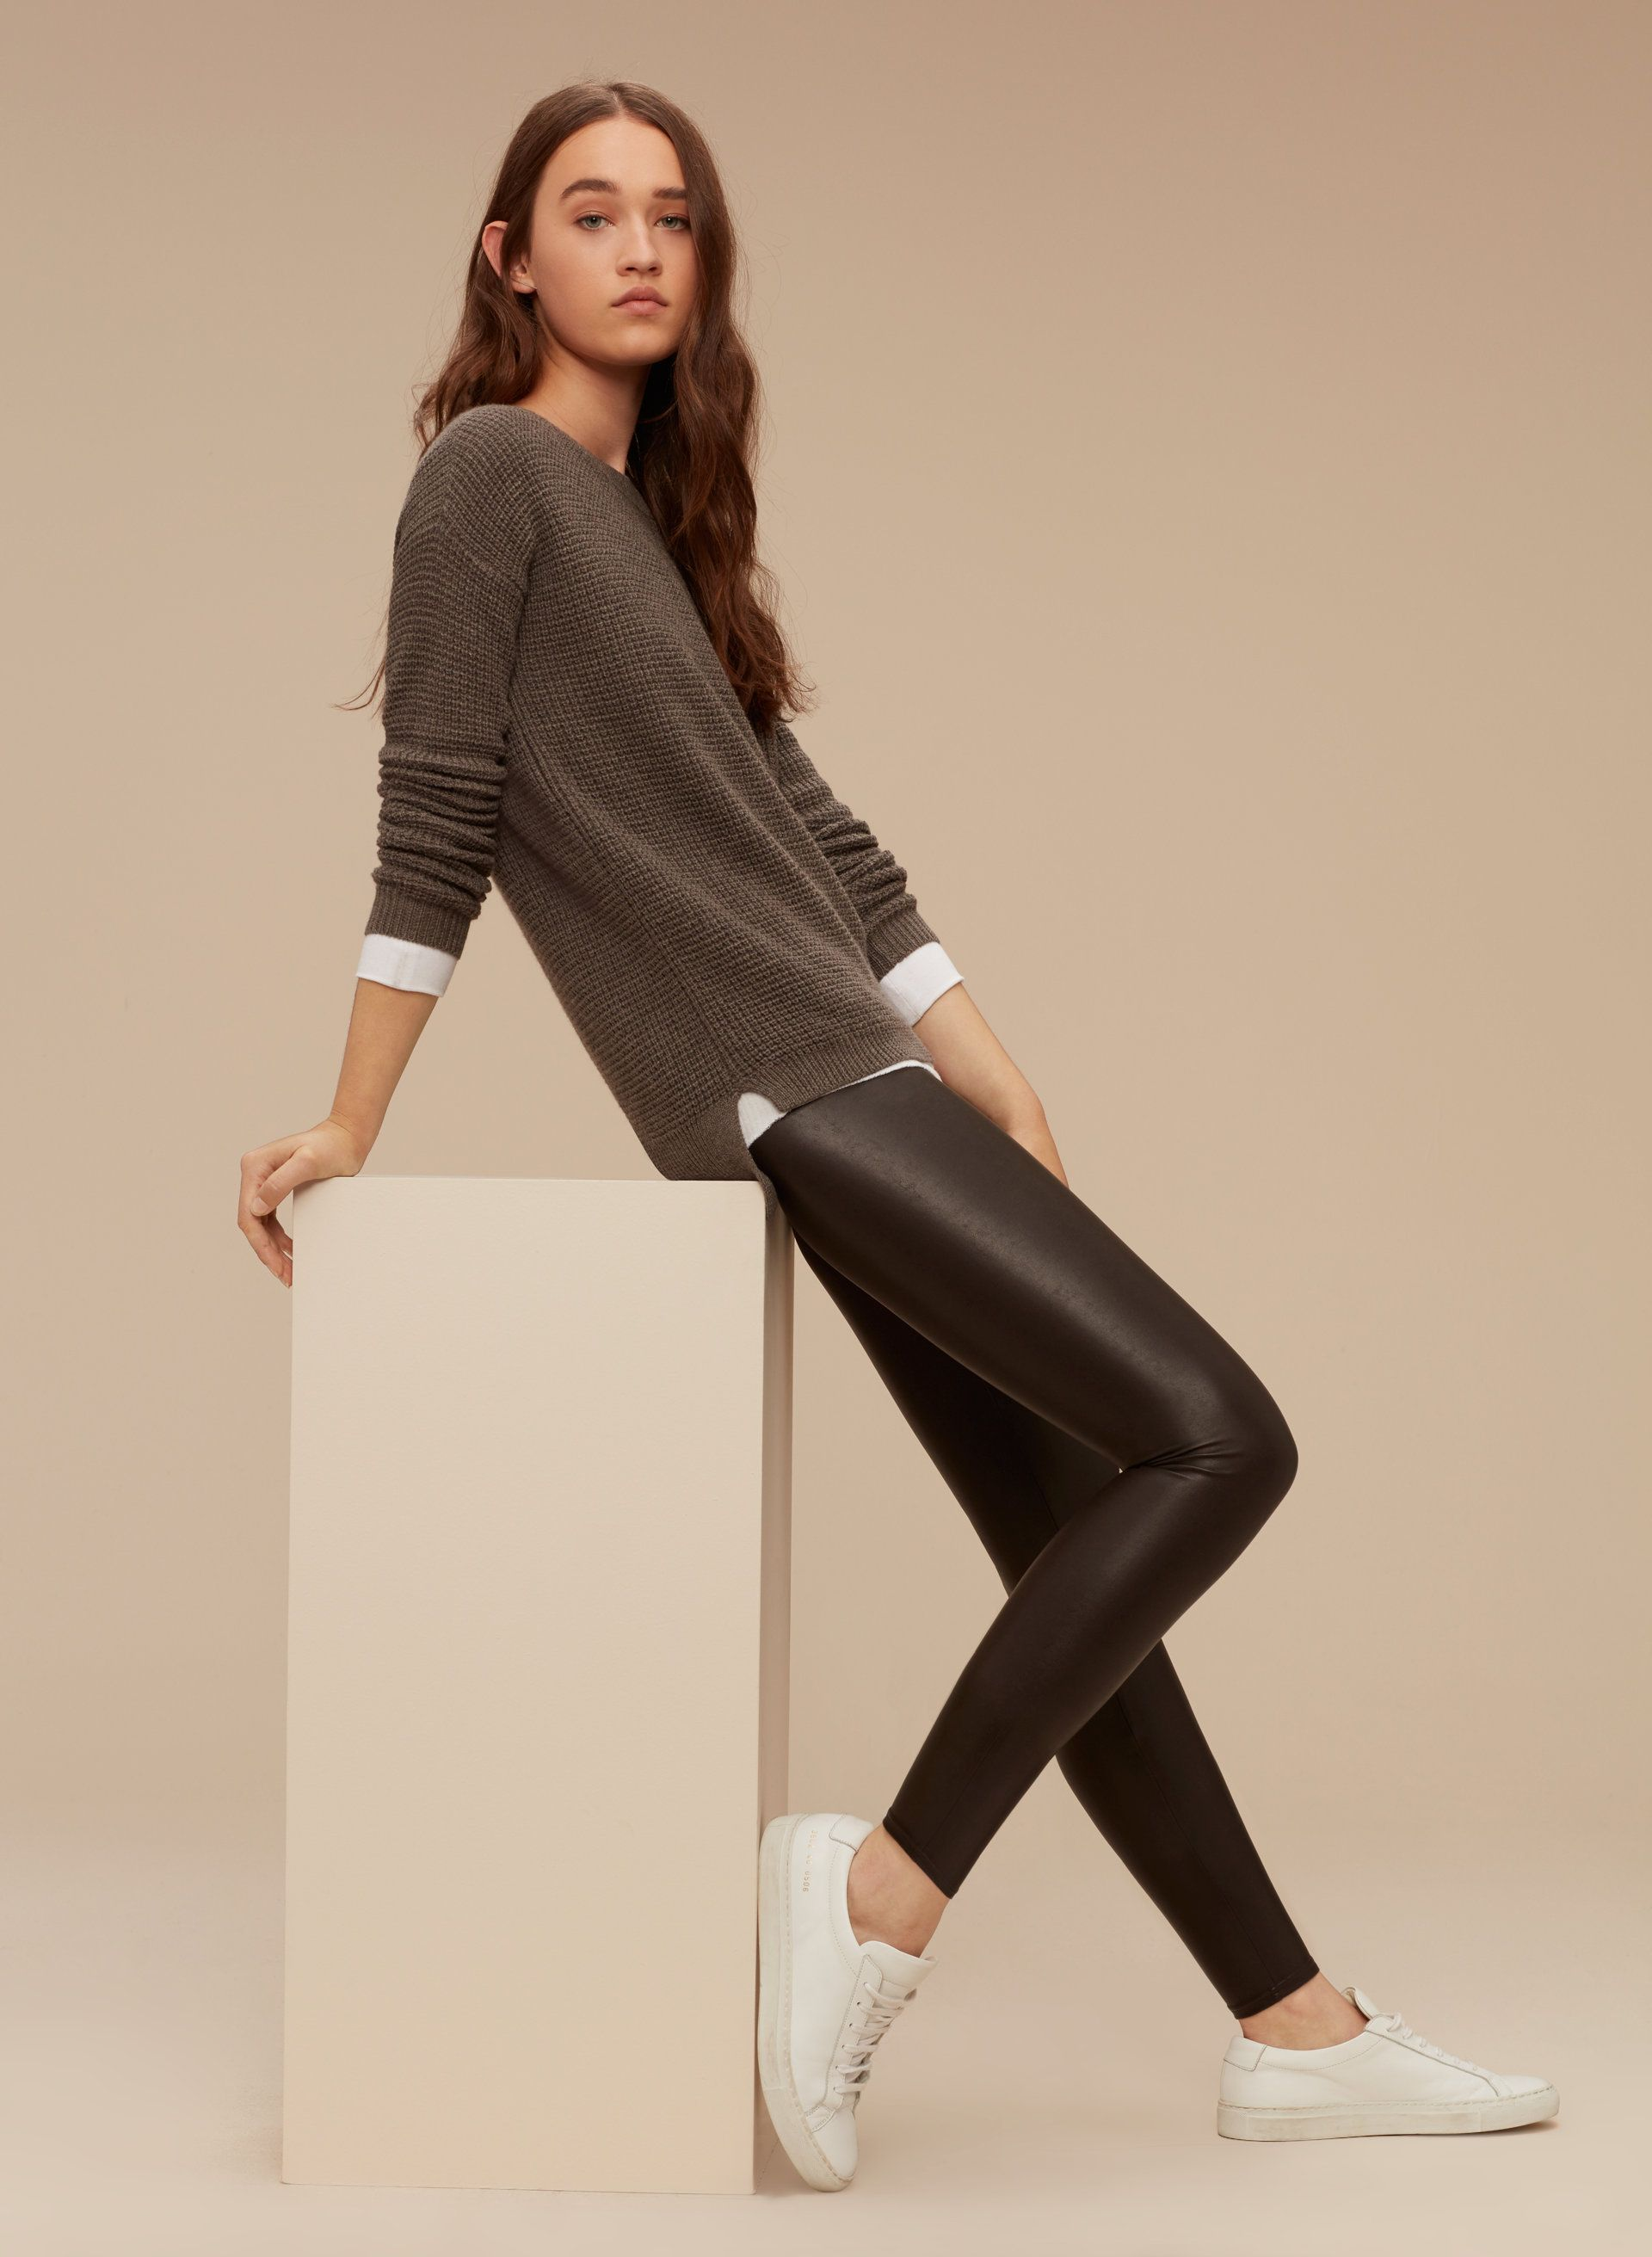 ce7e293bce5e0 Daria ankle pant in 2019 | WISHLIST | Fashion, Ankle pants, Fall outfits